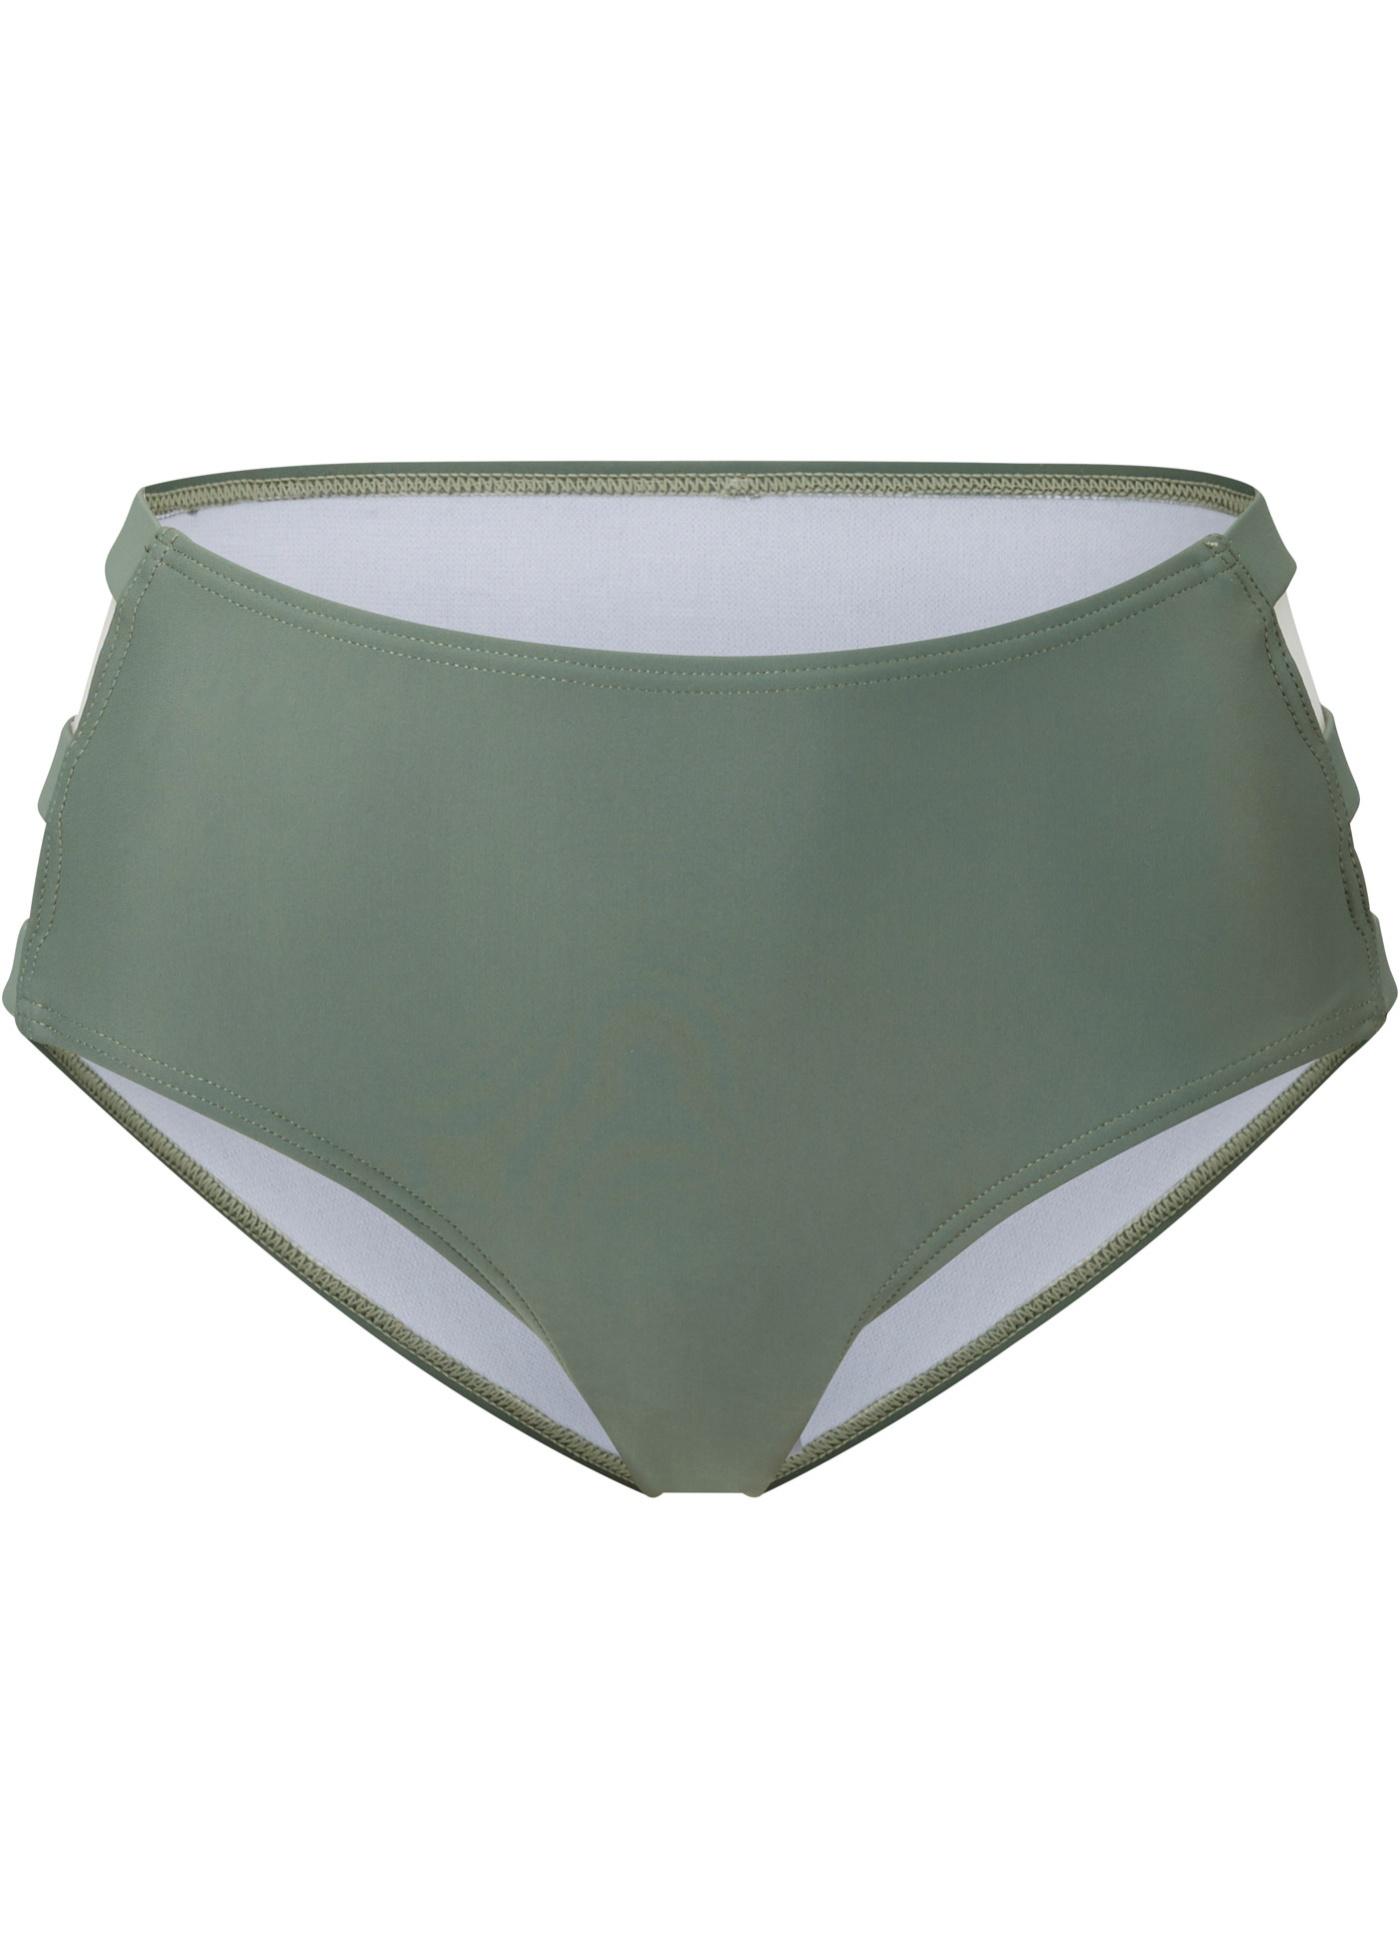 Bademode - Maxi Bikinihose › bonprix › grün  - Onlineshop Bonprix